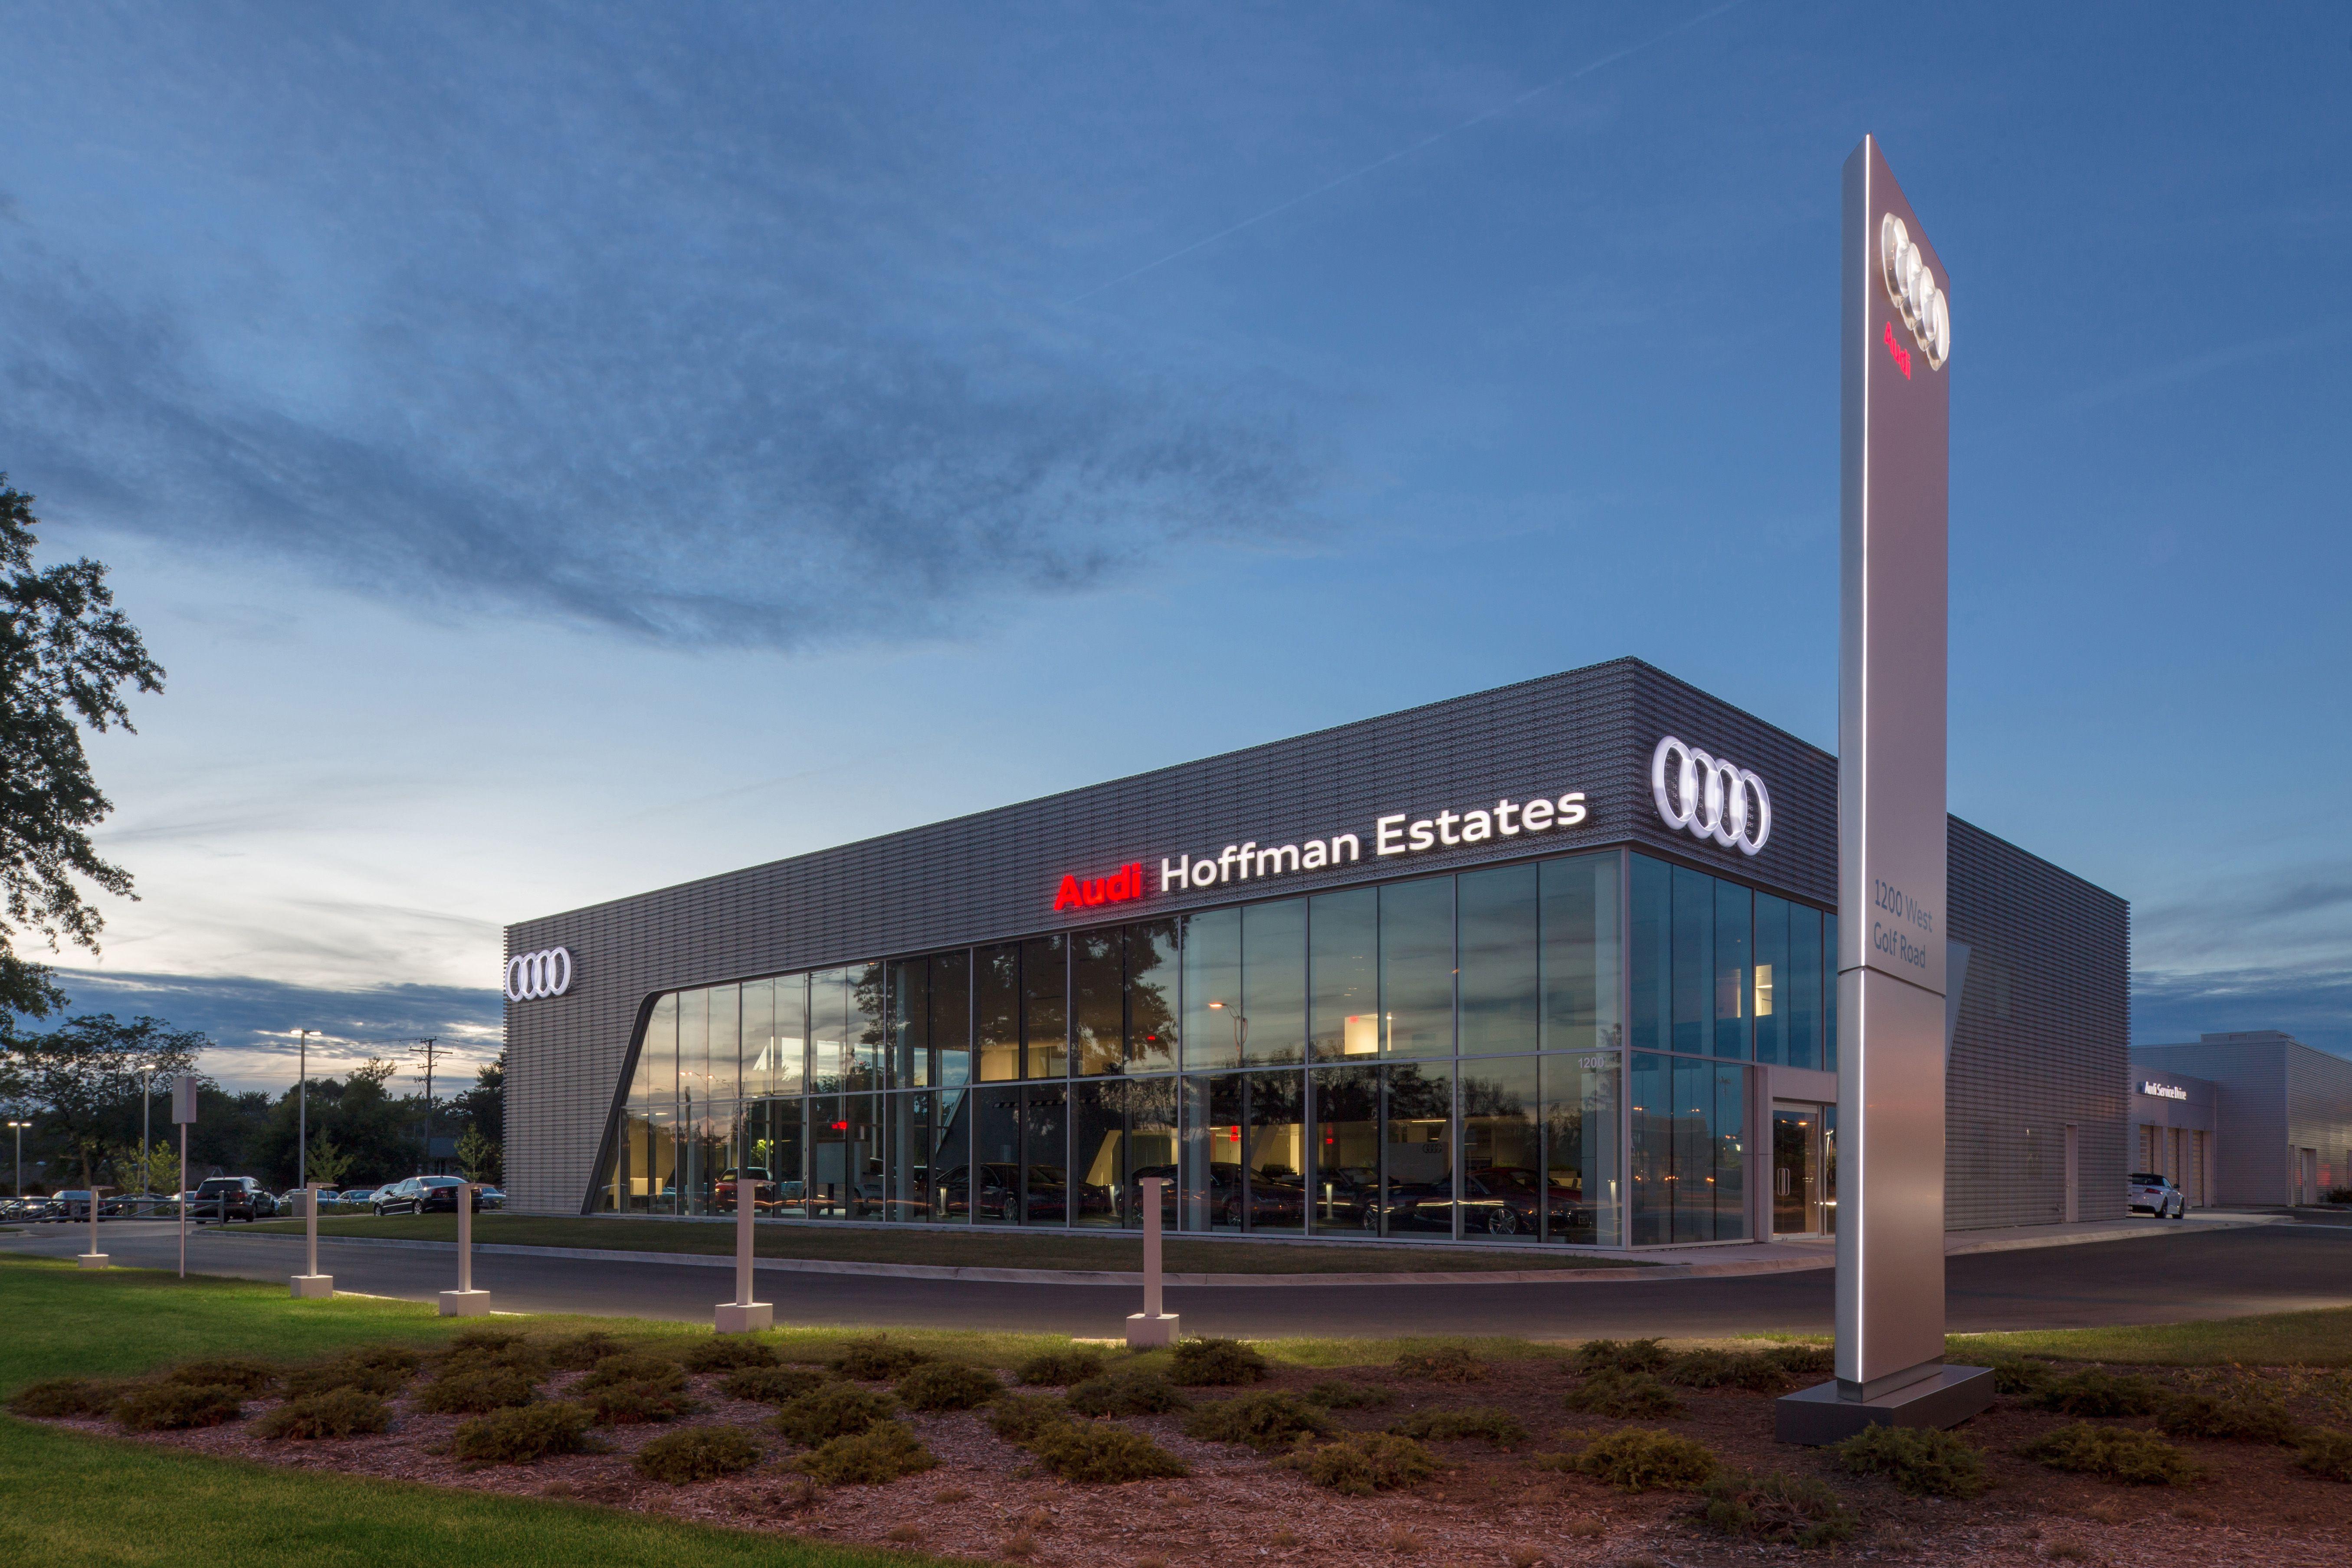 Audi Dealership Hoffman Estates Illinois Audi Car Dealership - Audi dealers illinois